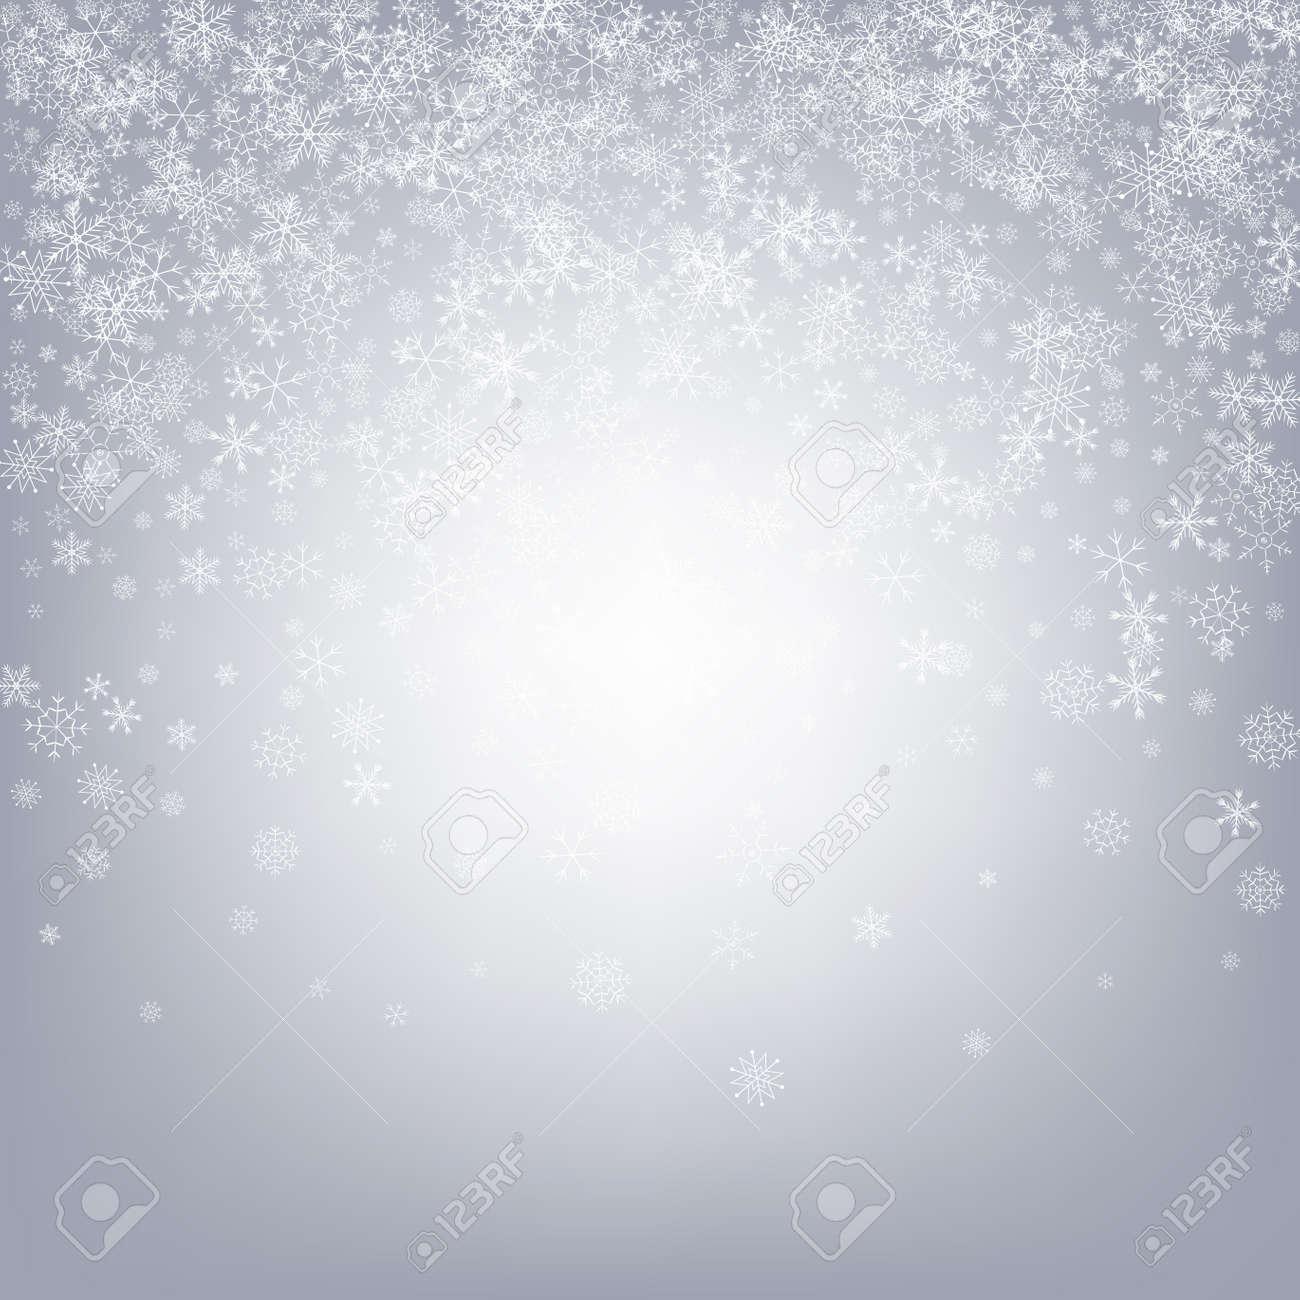 Gray Snow Vector Gray Background. Abstract Snowflake Design. White Xmas Illustration. Sky Snowfall Transparent. - 158510772